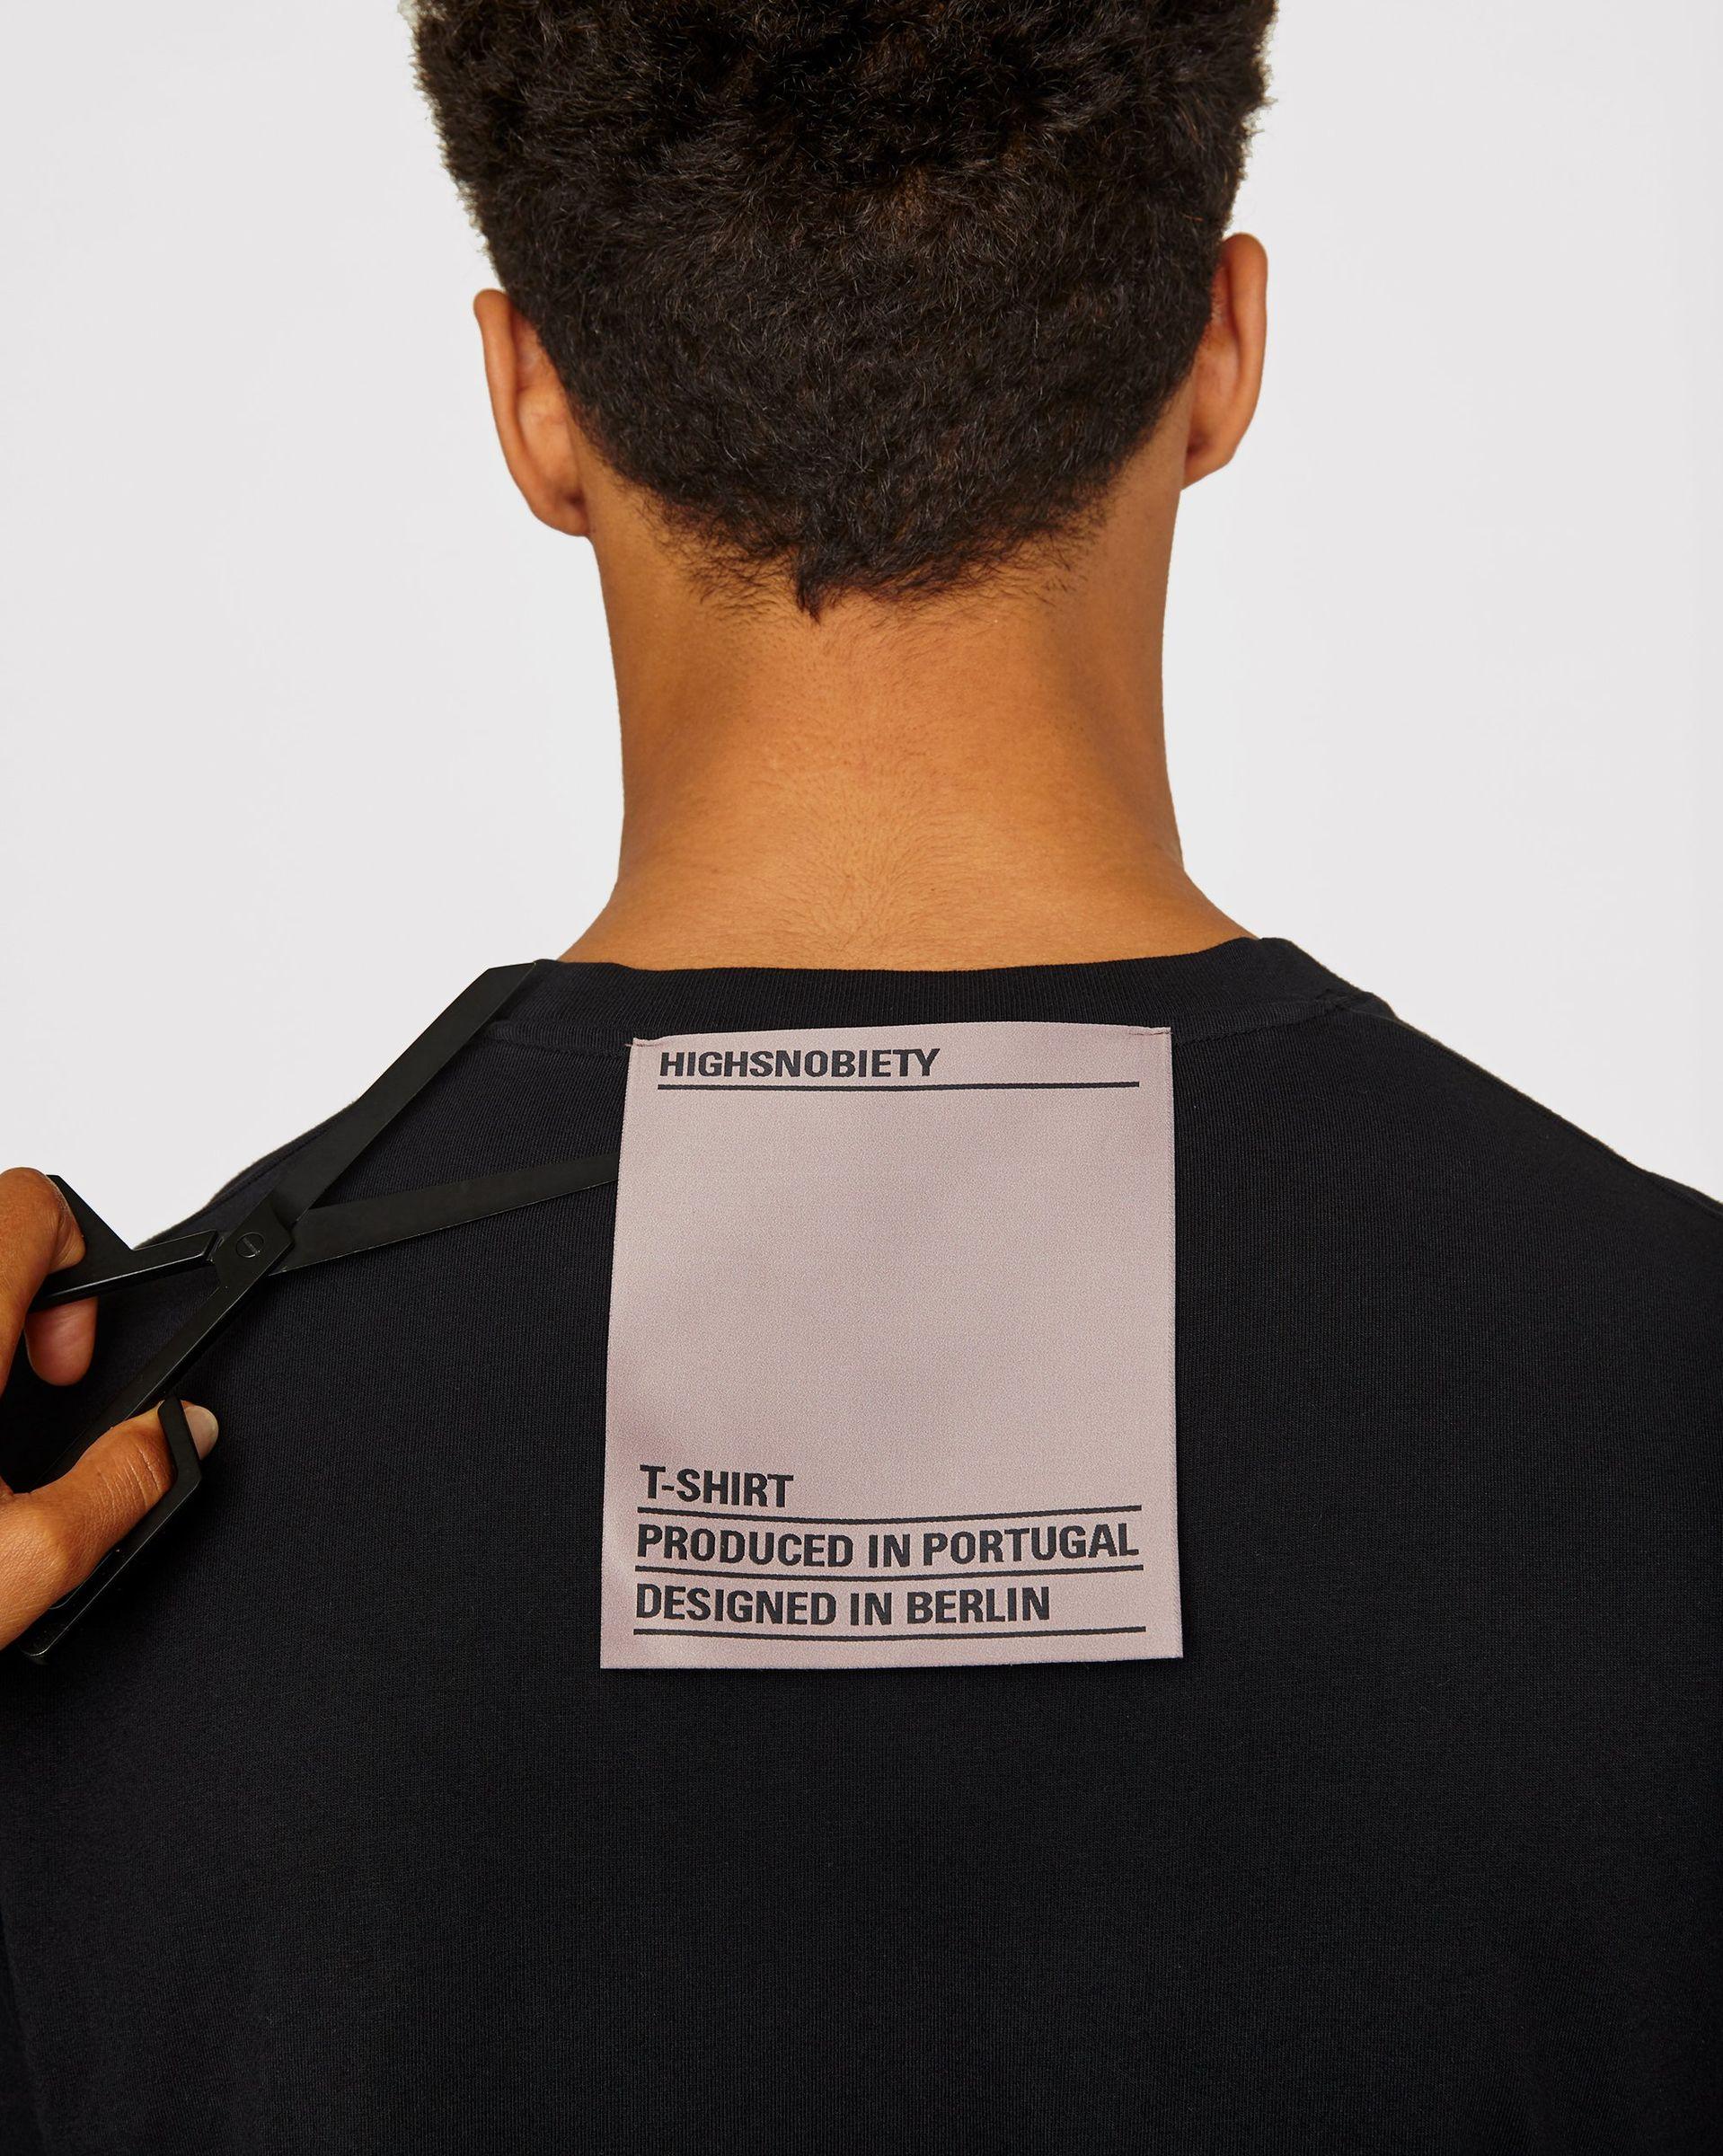 Highsnobiety Staples - T-Shirt Black - Image 4